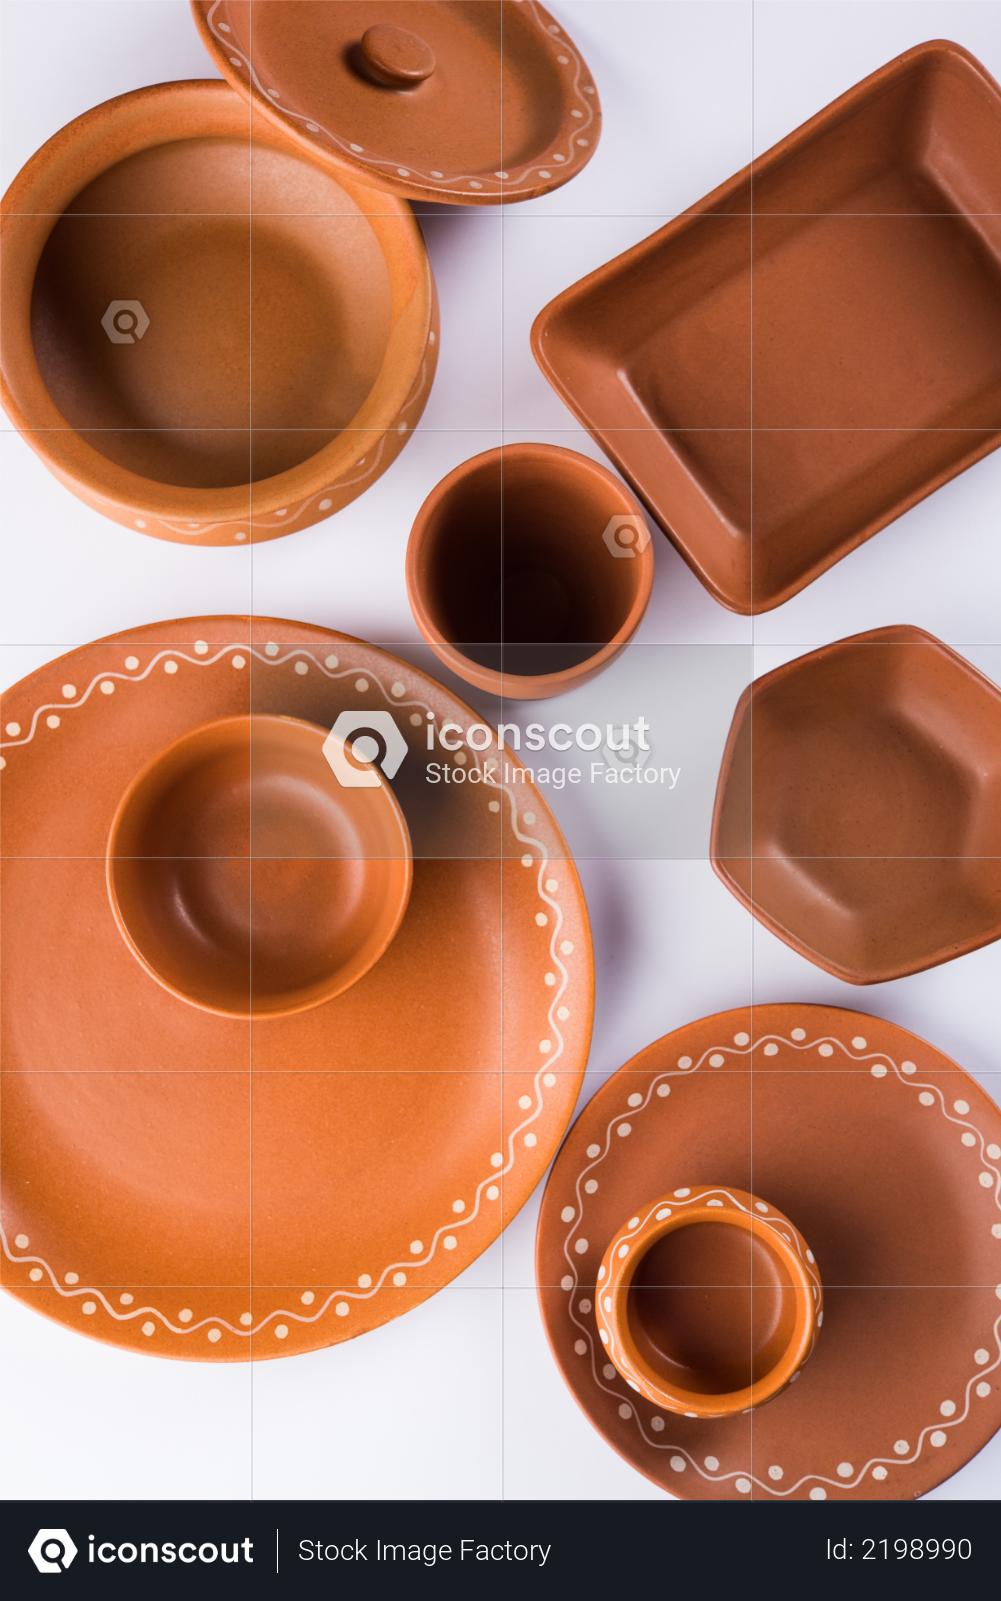 Premium Empty terracotta dinnerware or